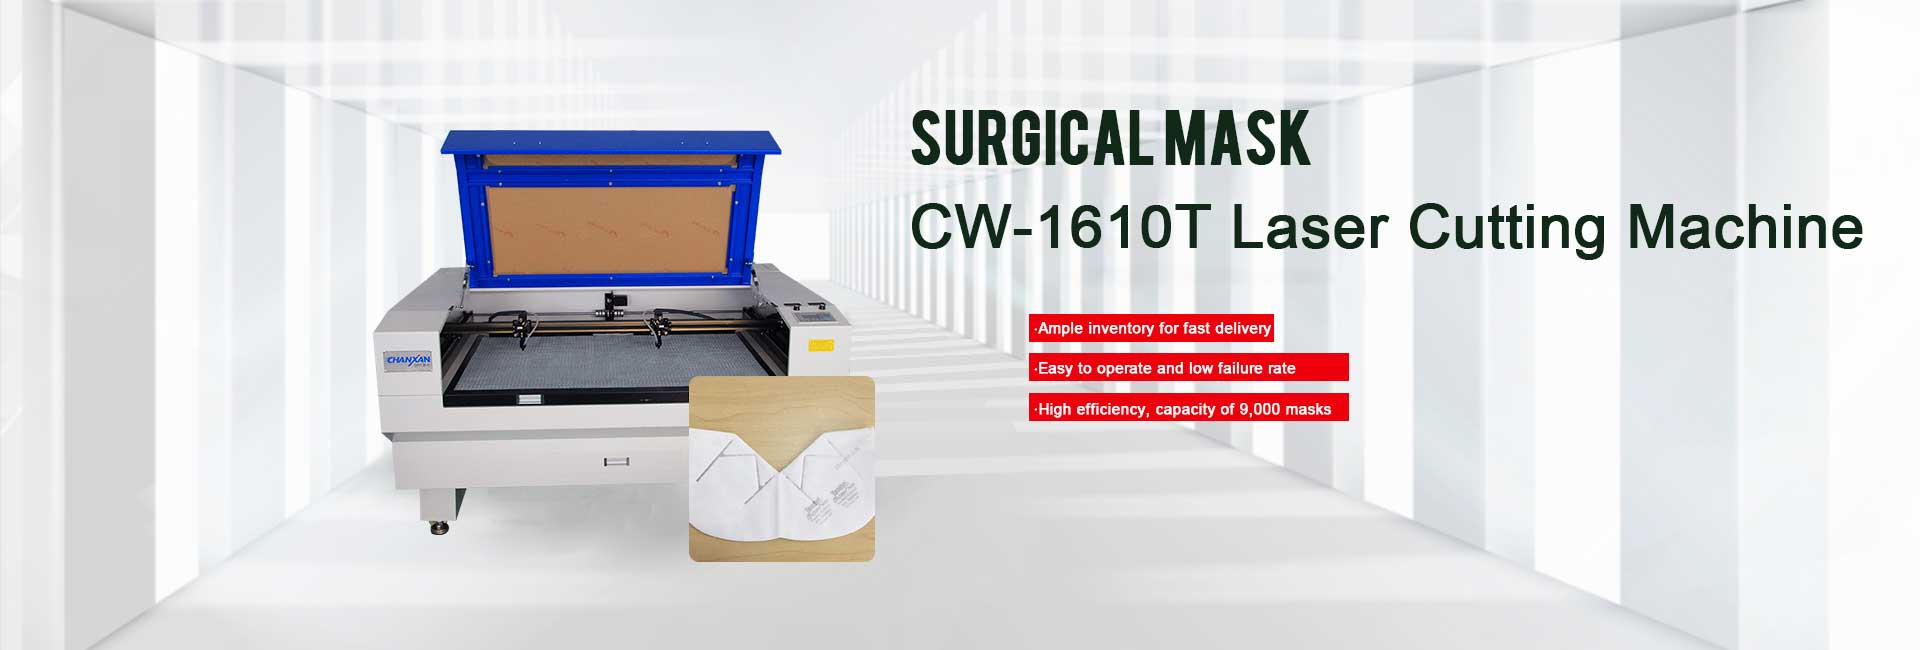 laser cutting mask